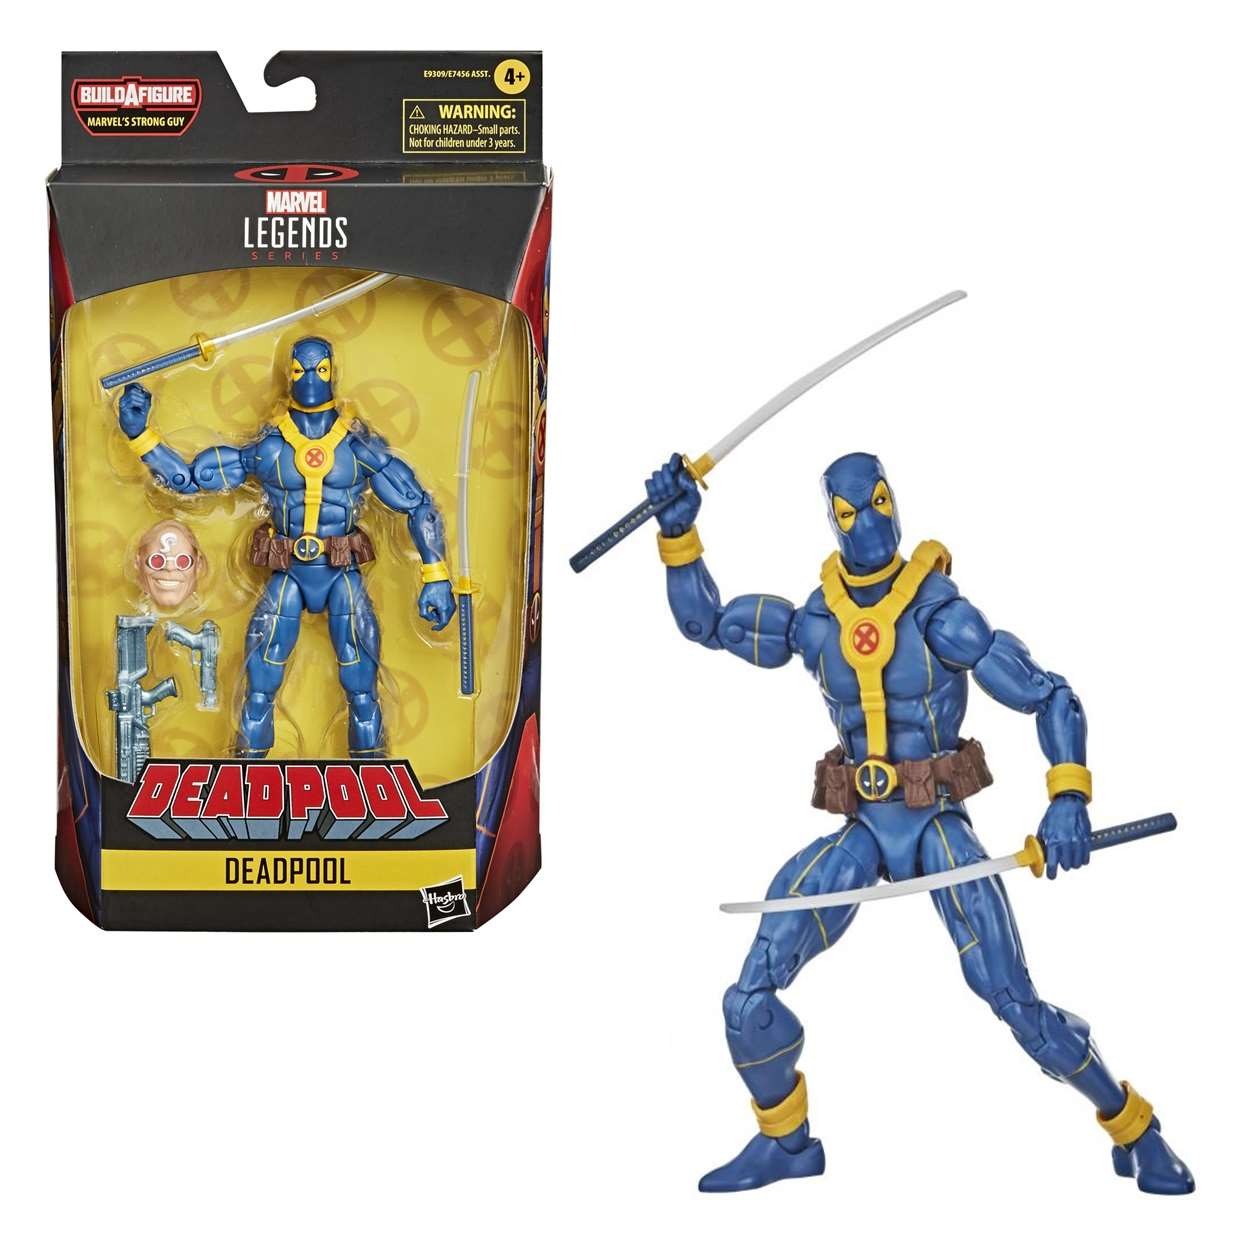 Deadpool Blue Figura Marvel B A F Strong Guy Legends Series